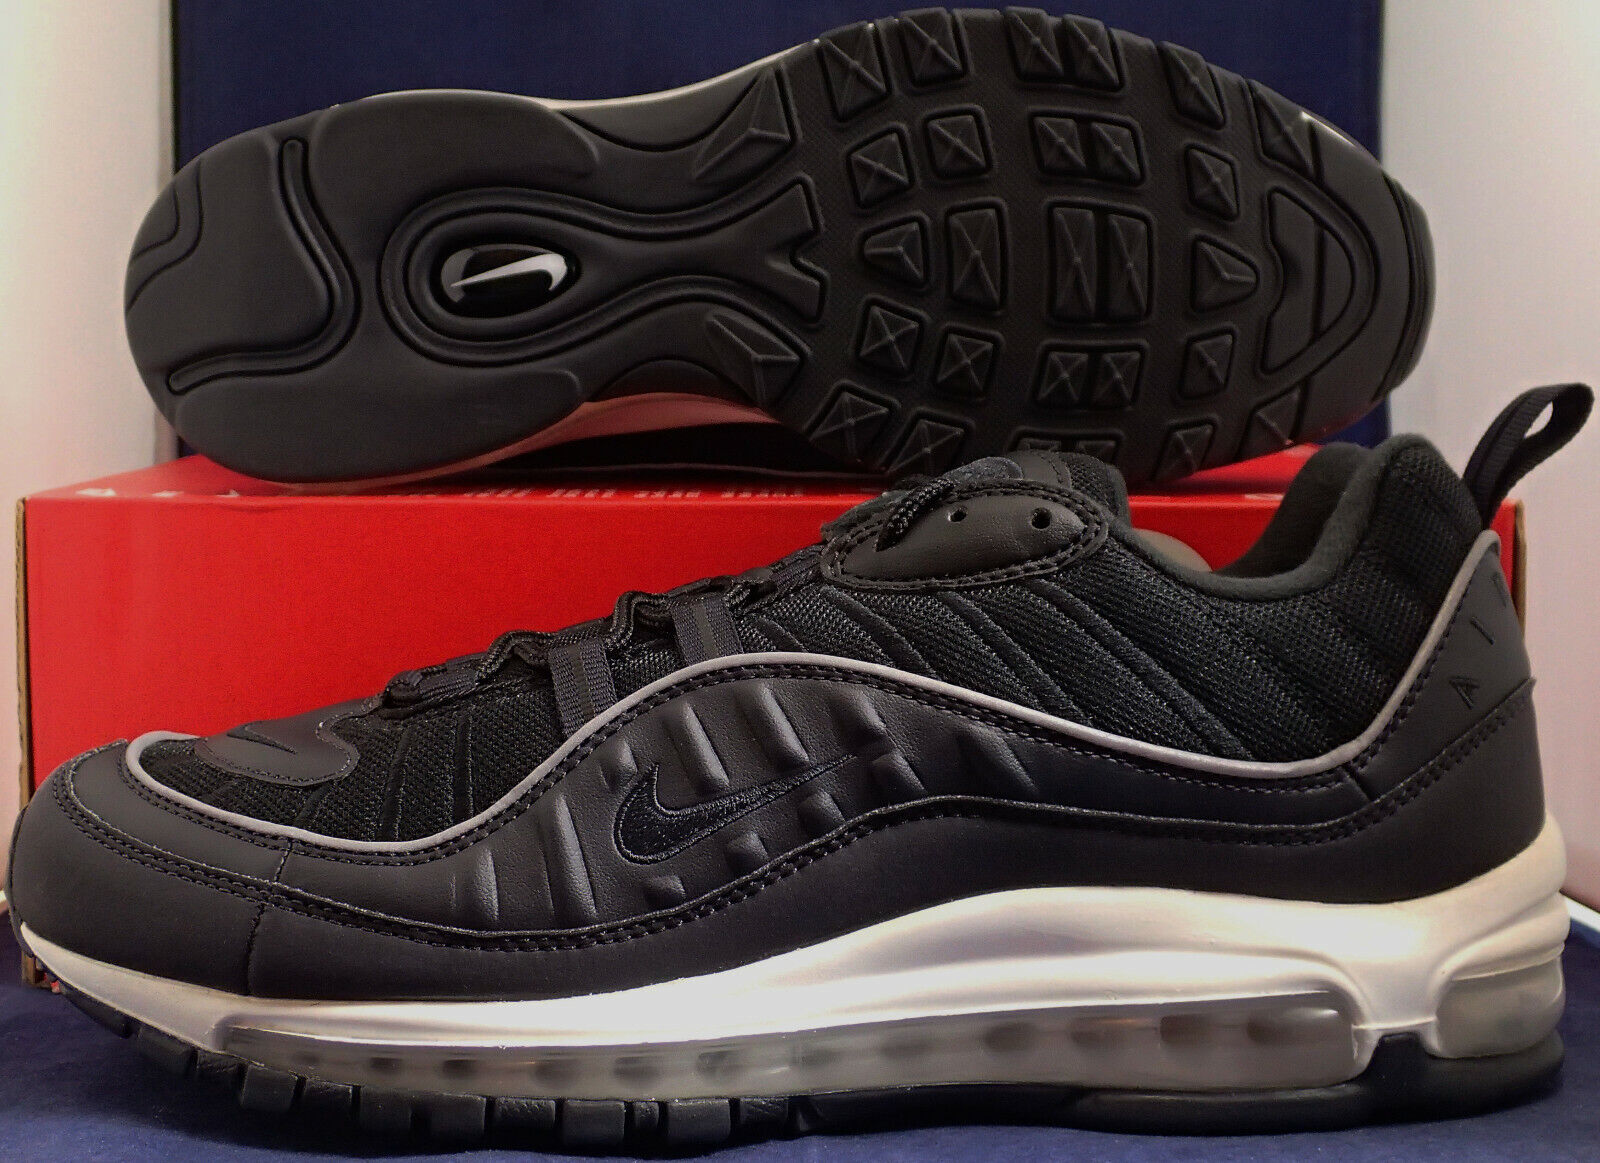 Nike Air Max 98 Oil Grey Black SZ 12 ( 640744-009 )